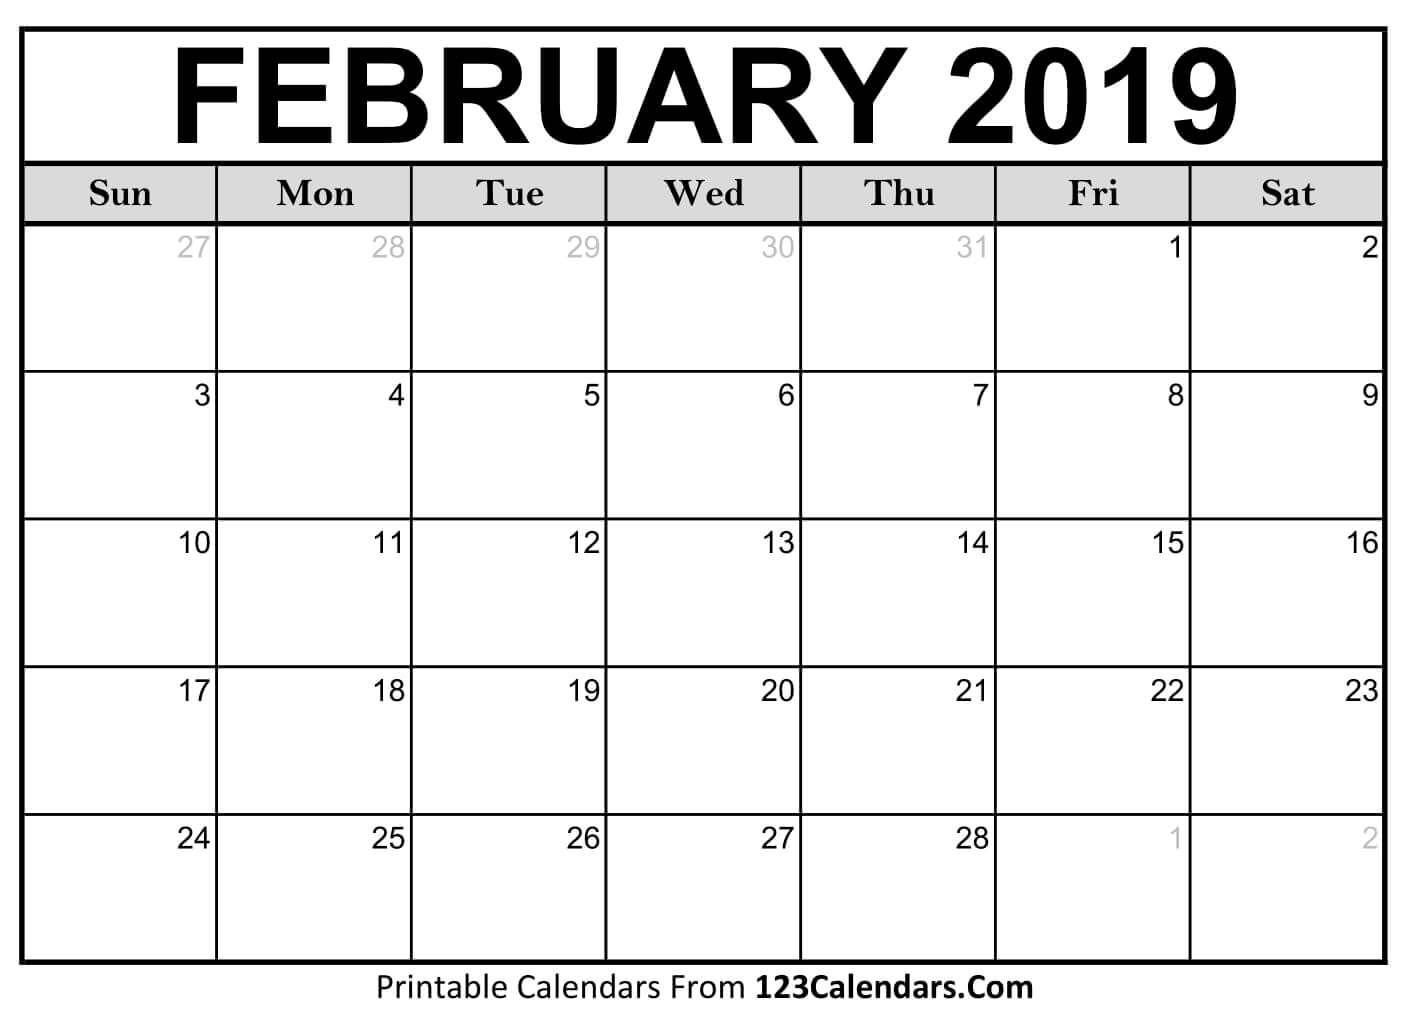 2019 Calendar February Pinterest